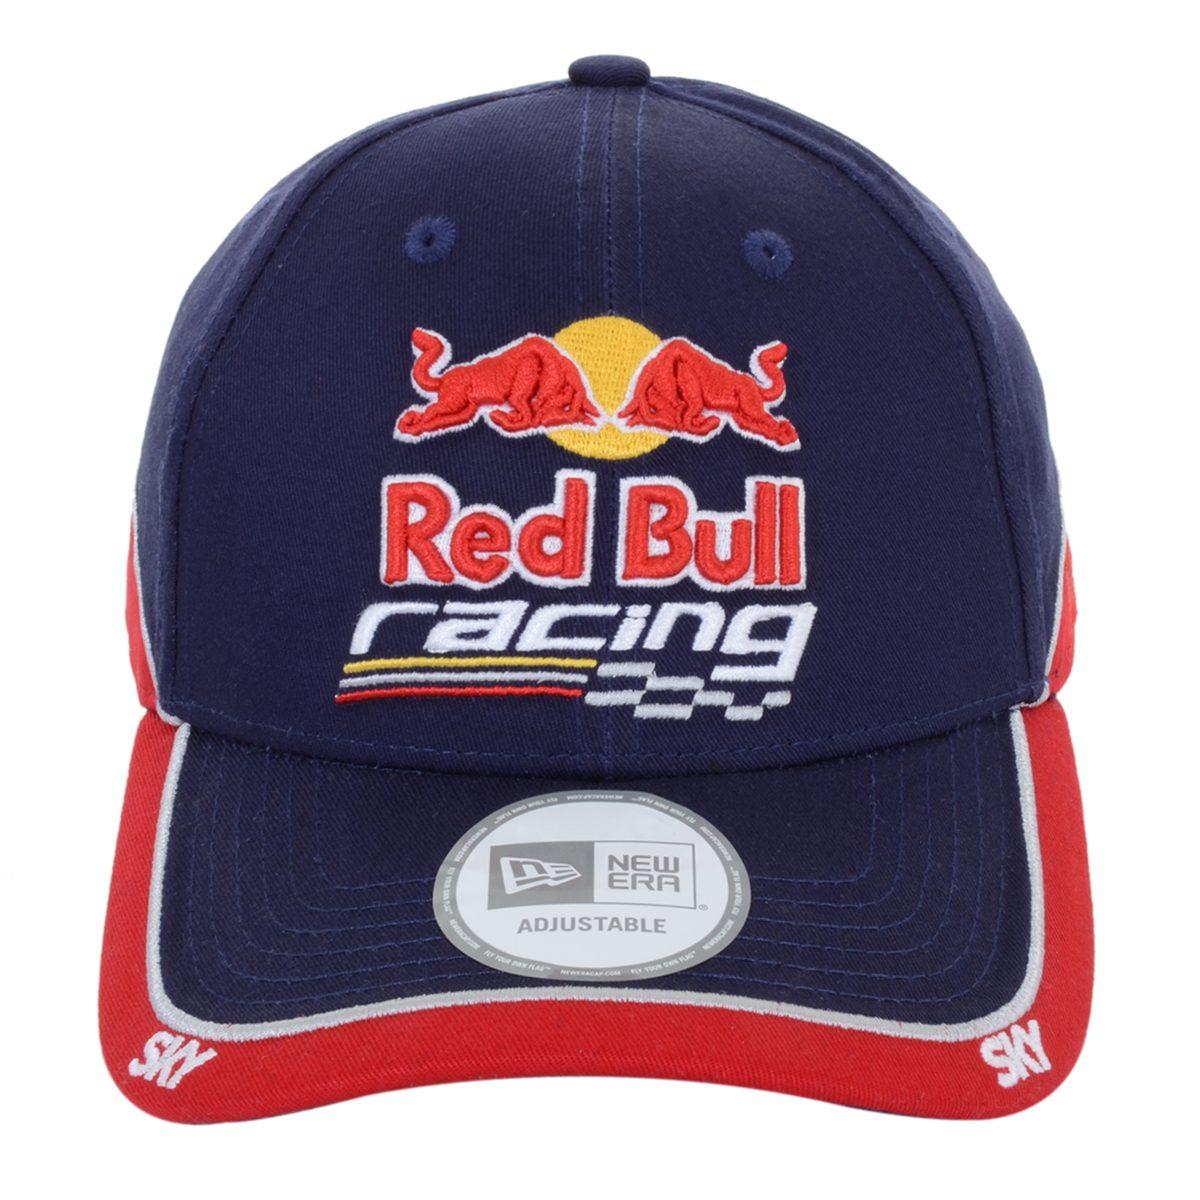 Boné Masculino New Era 940 Red Bull Sky Marinho - R  99 1084b107315